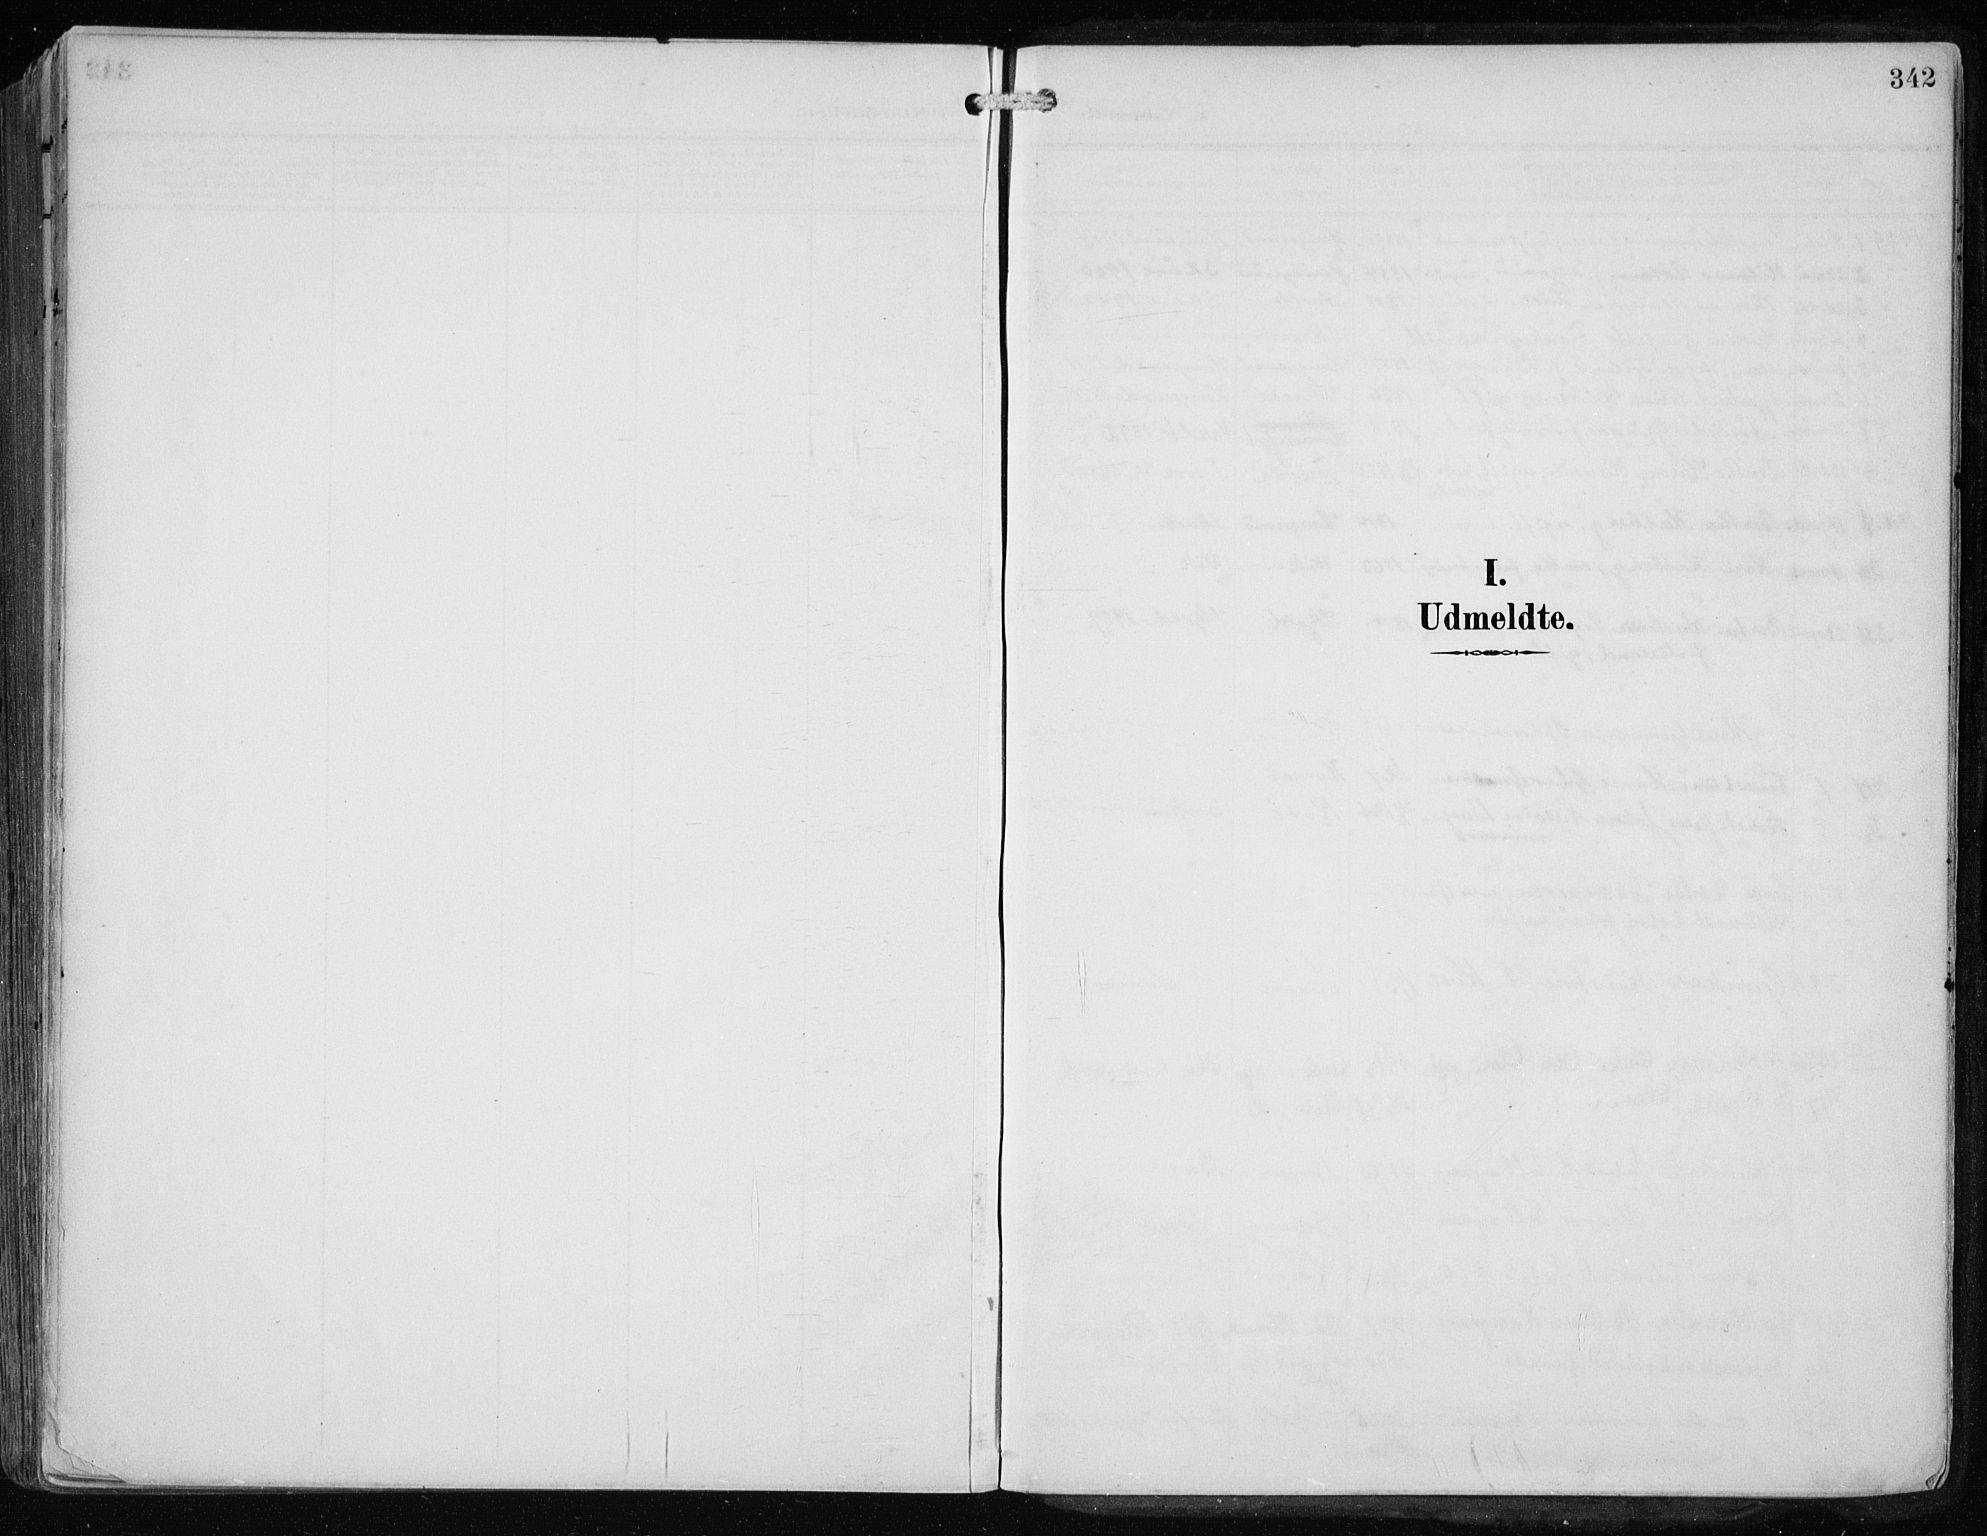 SAST, Haugesund sokneprestkontor, H/Ha/Haa/L0010: Ministerialbok nr. A 10, 1909-1935, s. 342